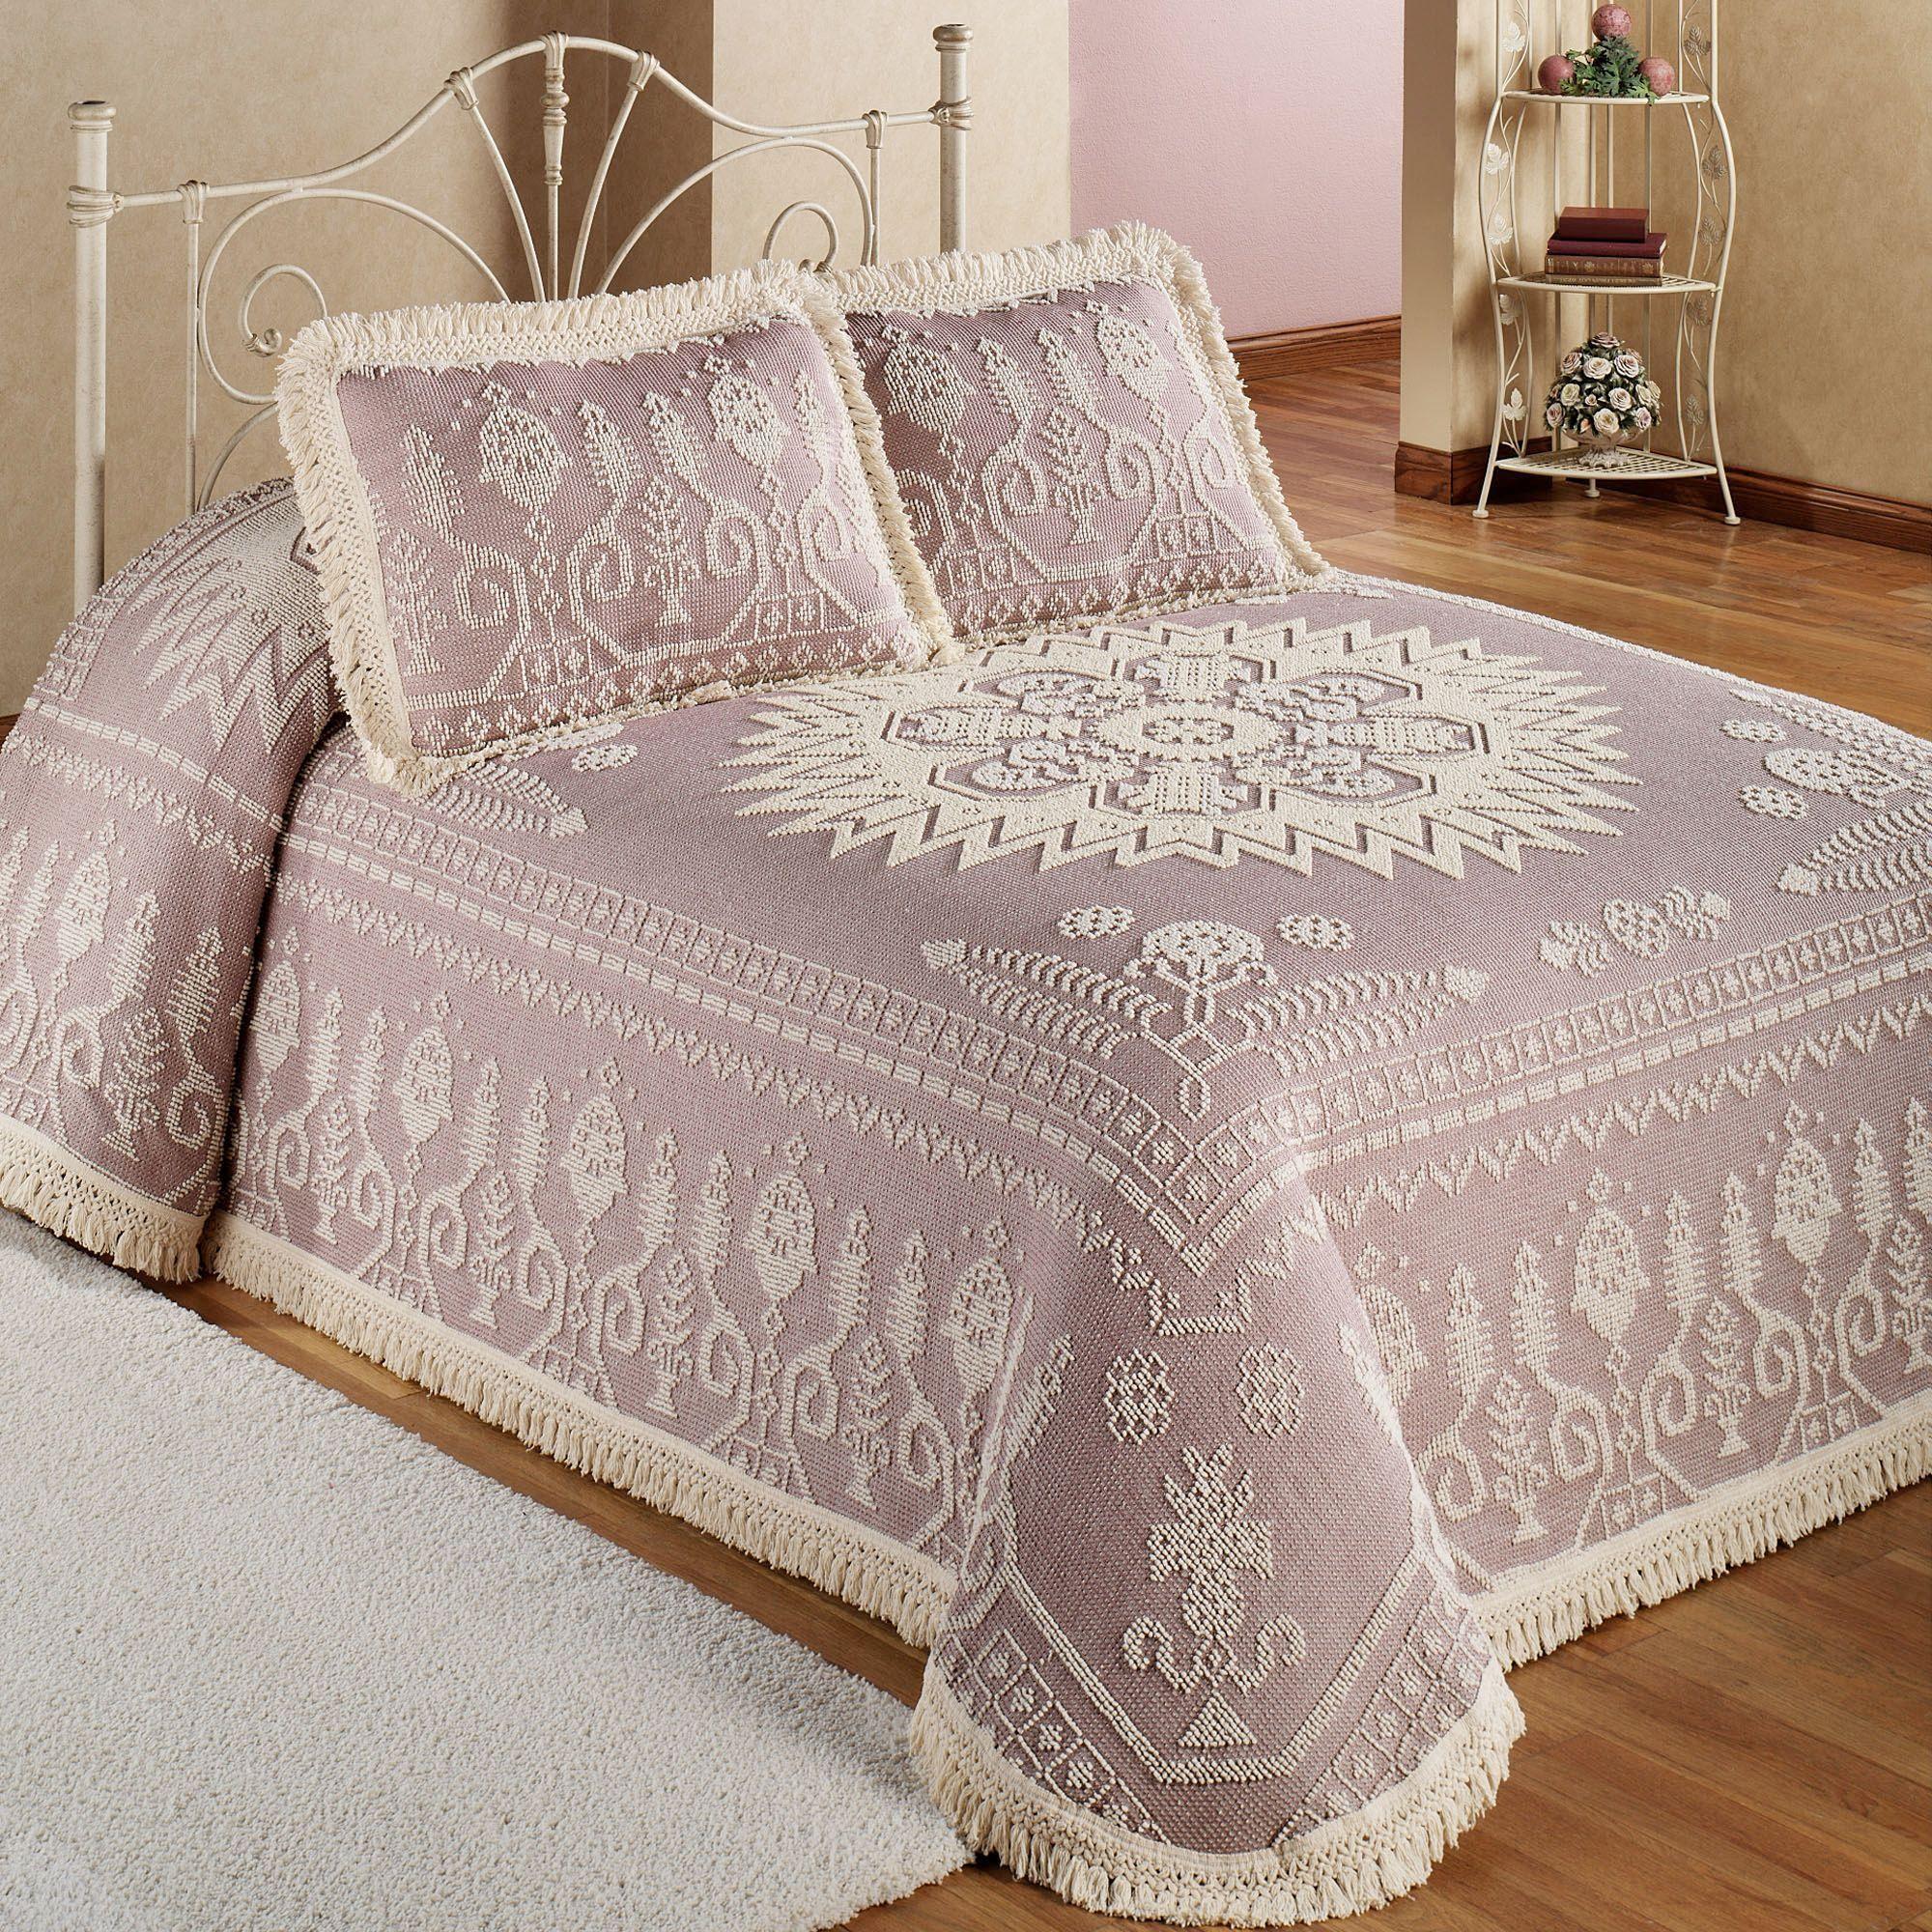 Spirit of America Candlewick Bedspread Bedding